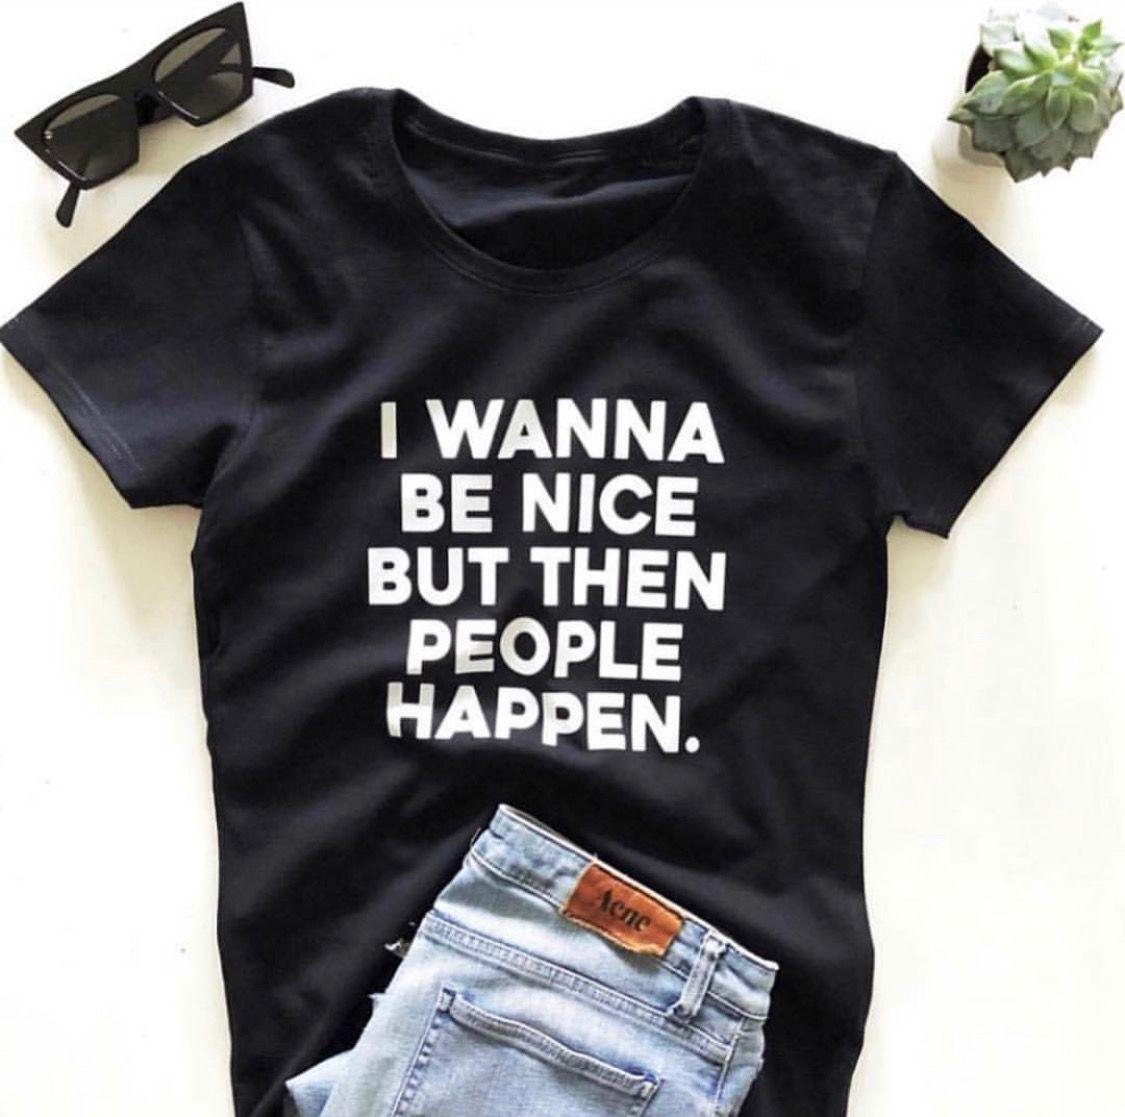 I wanna be nice but then people happen. T-shirt  — Nallashop.net